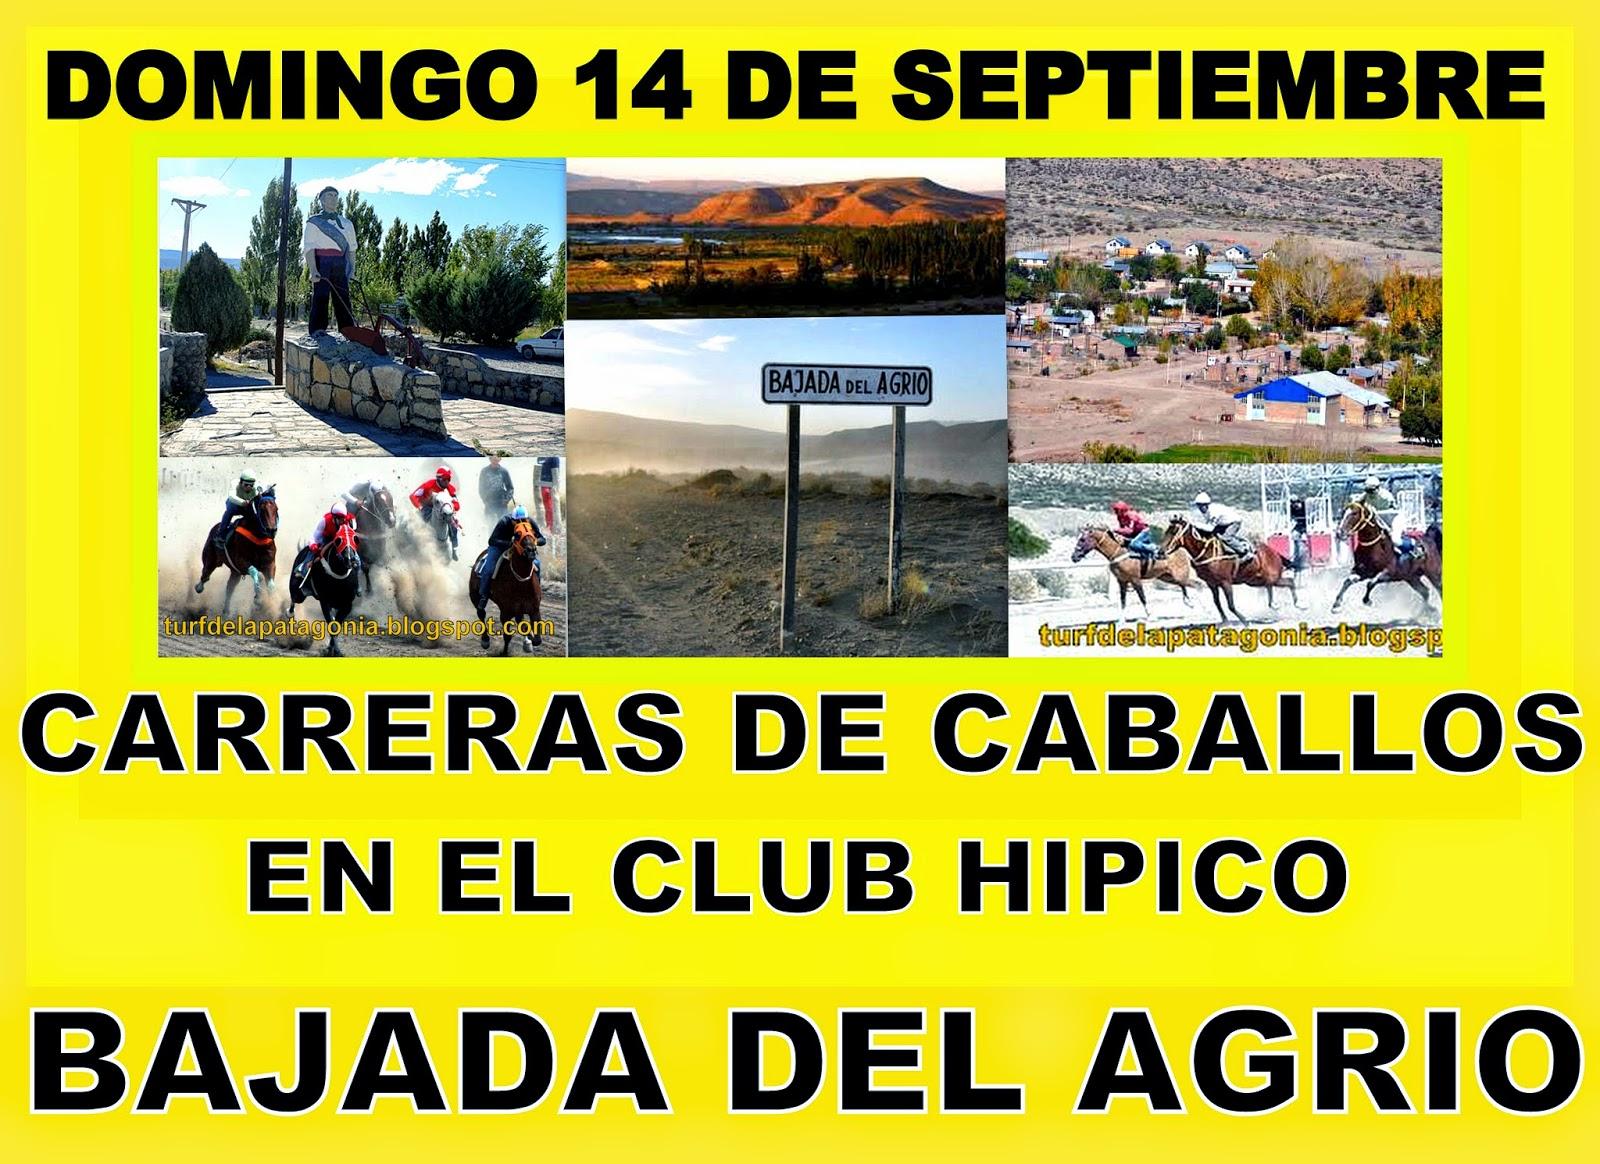 http://turfdelapatagonia.blogspot.com.ar/2014/09/1409-programa-de-carreras-de-caballos_60.html